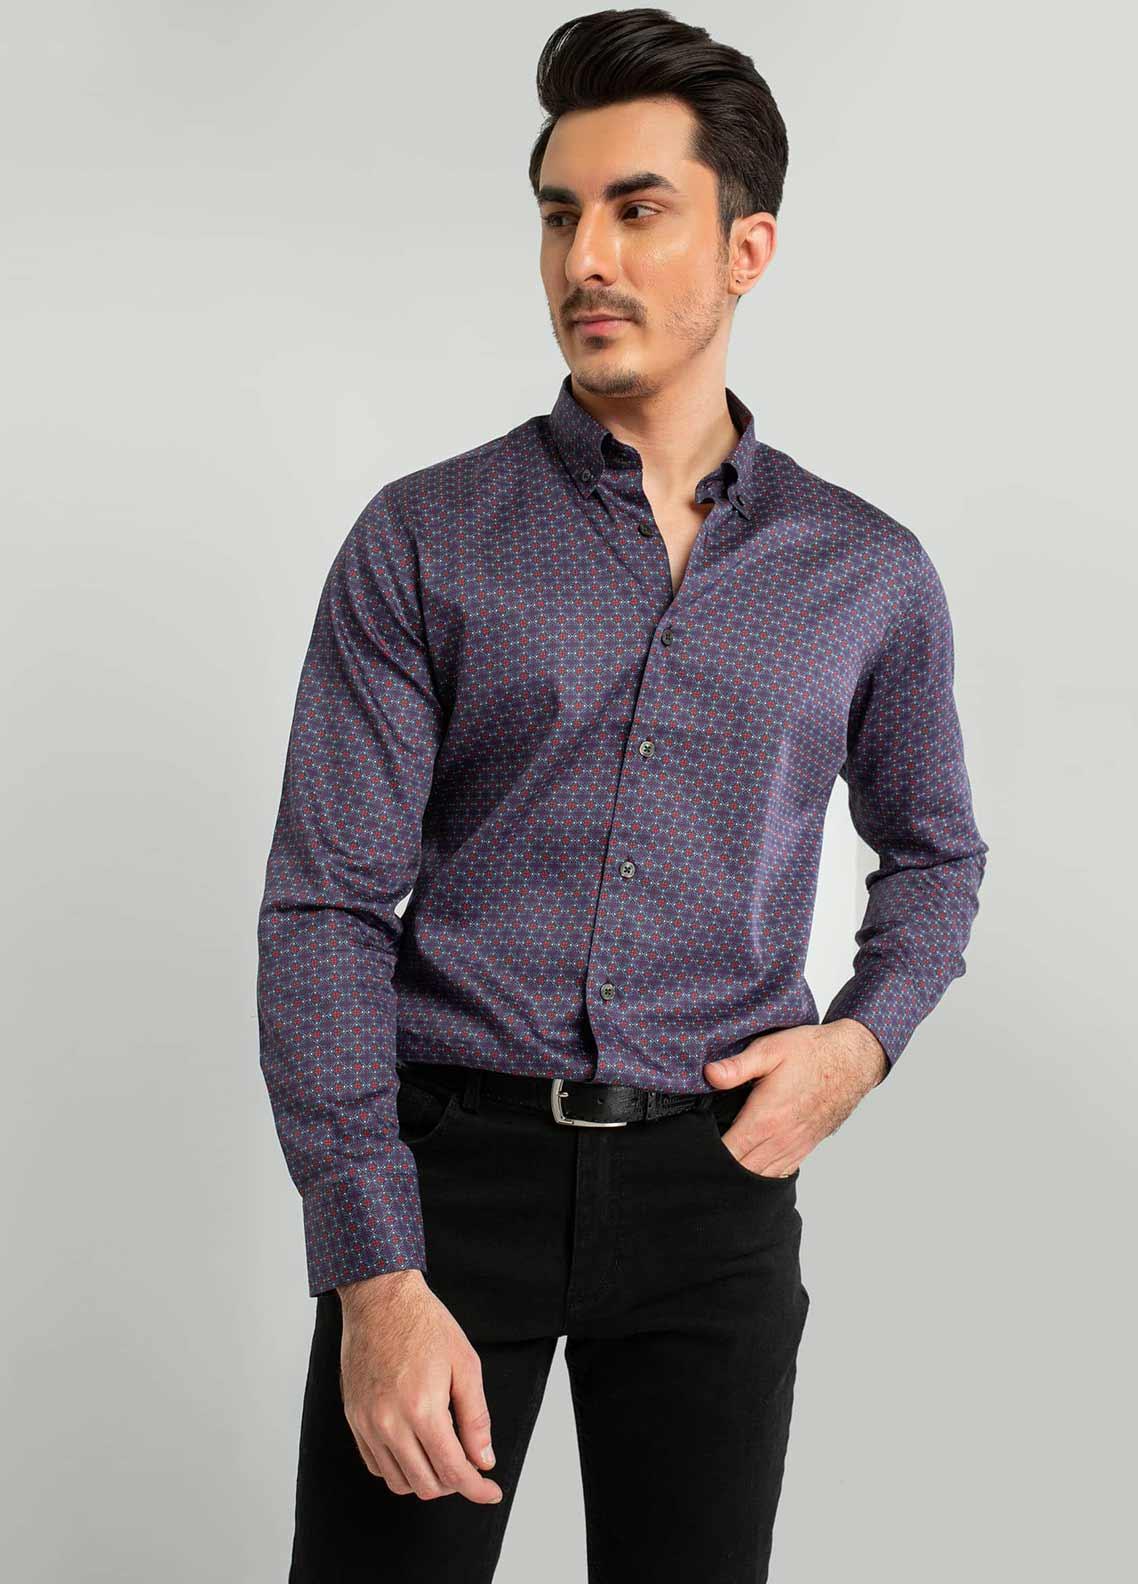 Brumano Cotton Formal Shirts for Men -  BM20SH Purple & Red Printed Shirt